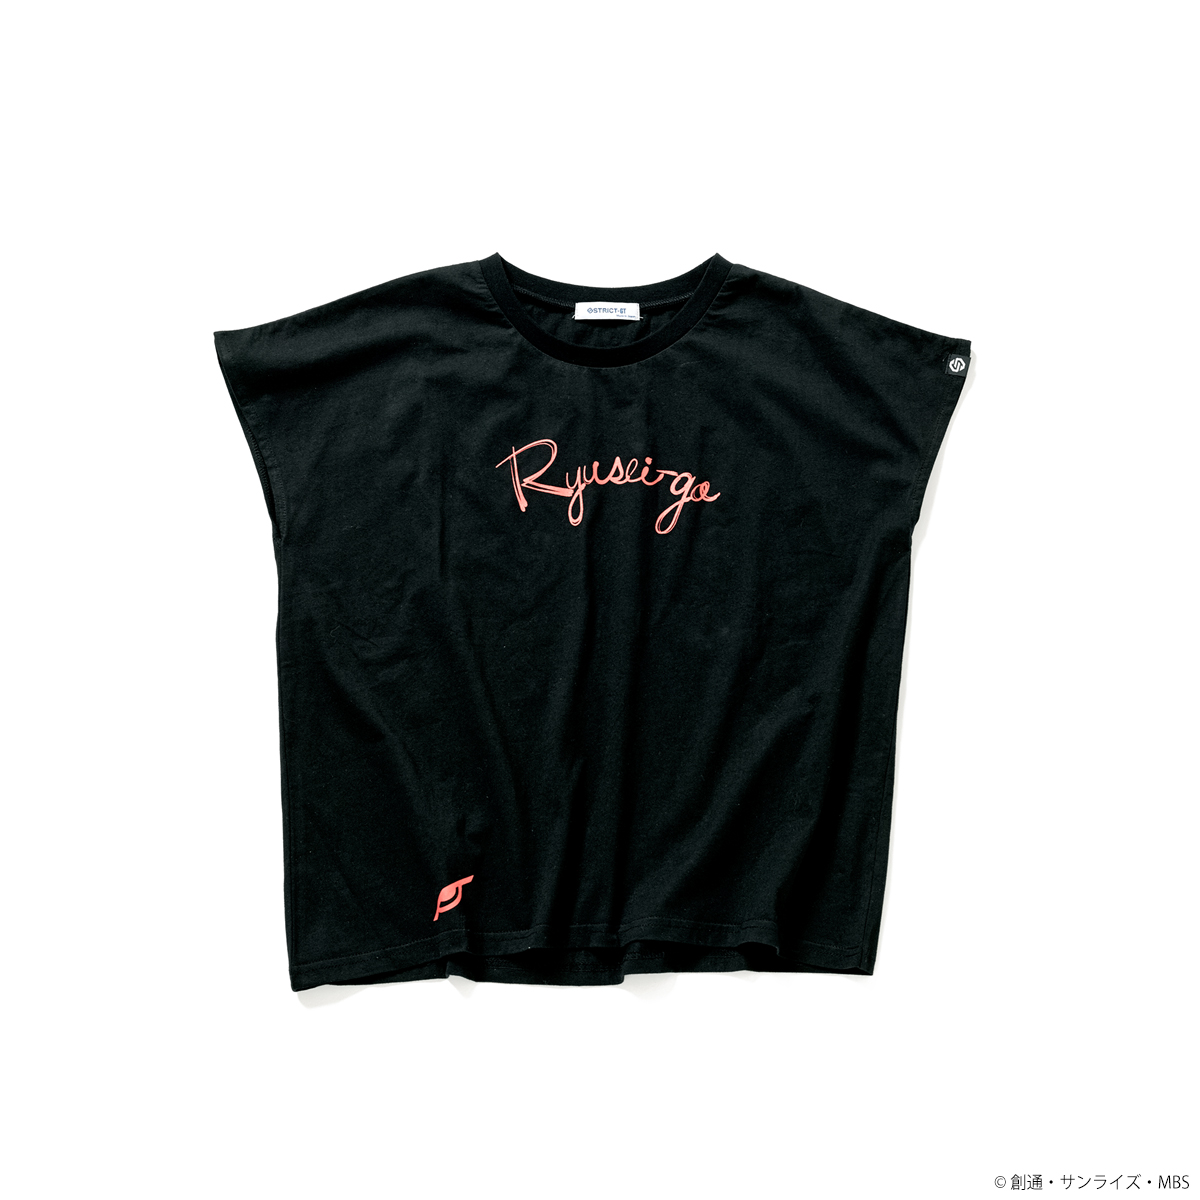 STRICT-G『機動戦士ガンダム 鉄血のオルフェンズ』 フレンチTシャツ 流星号